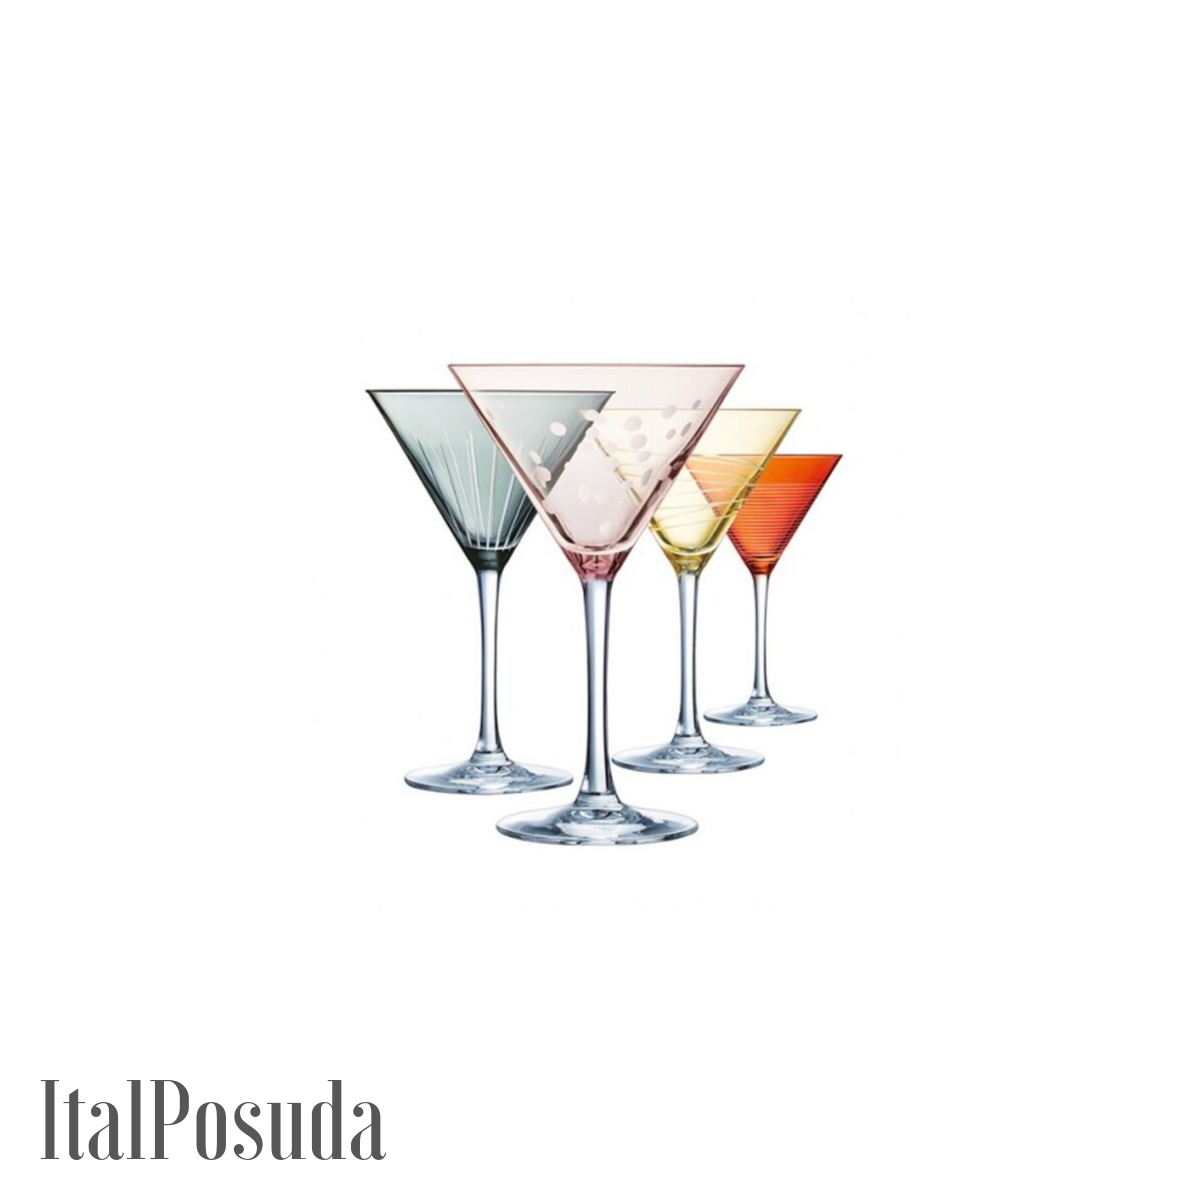 Набор бокалов для коктейля Eclat Cristal d'Arques Illumination Colors (Иллюминейшн Колорс), 4 шт L7603